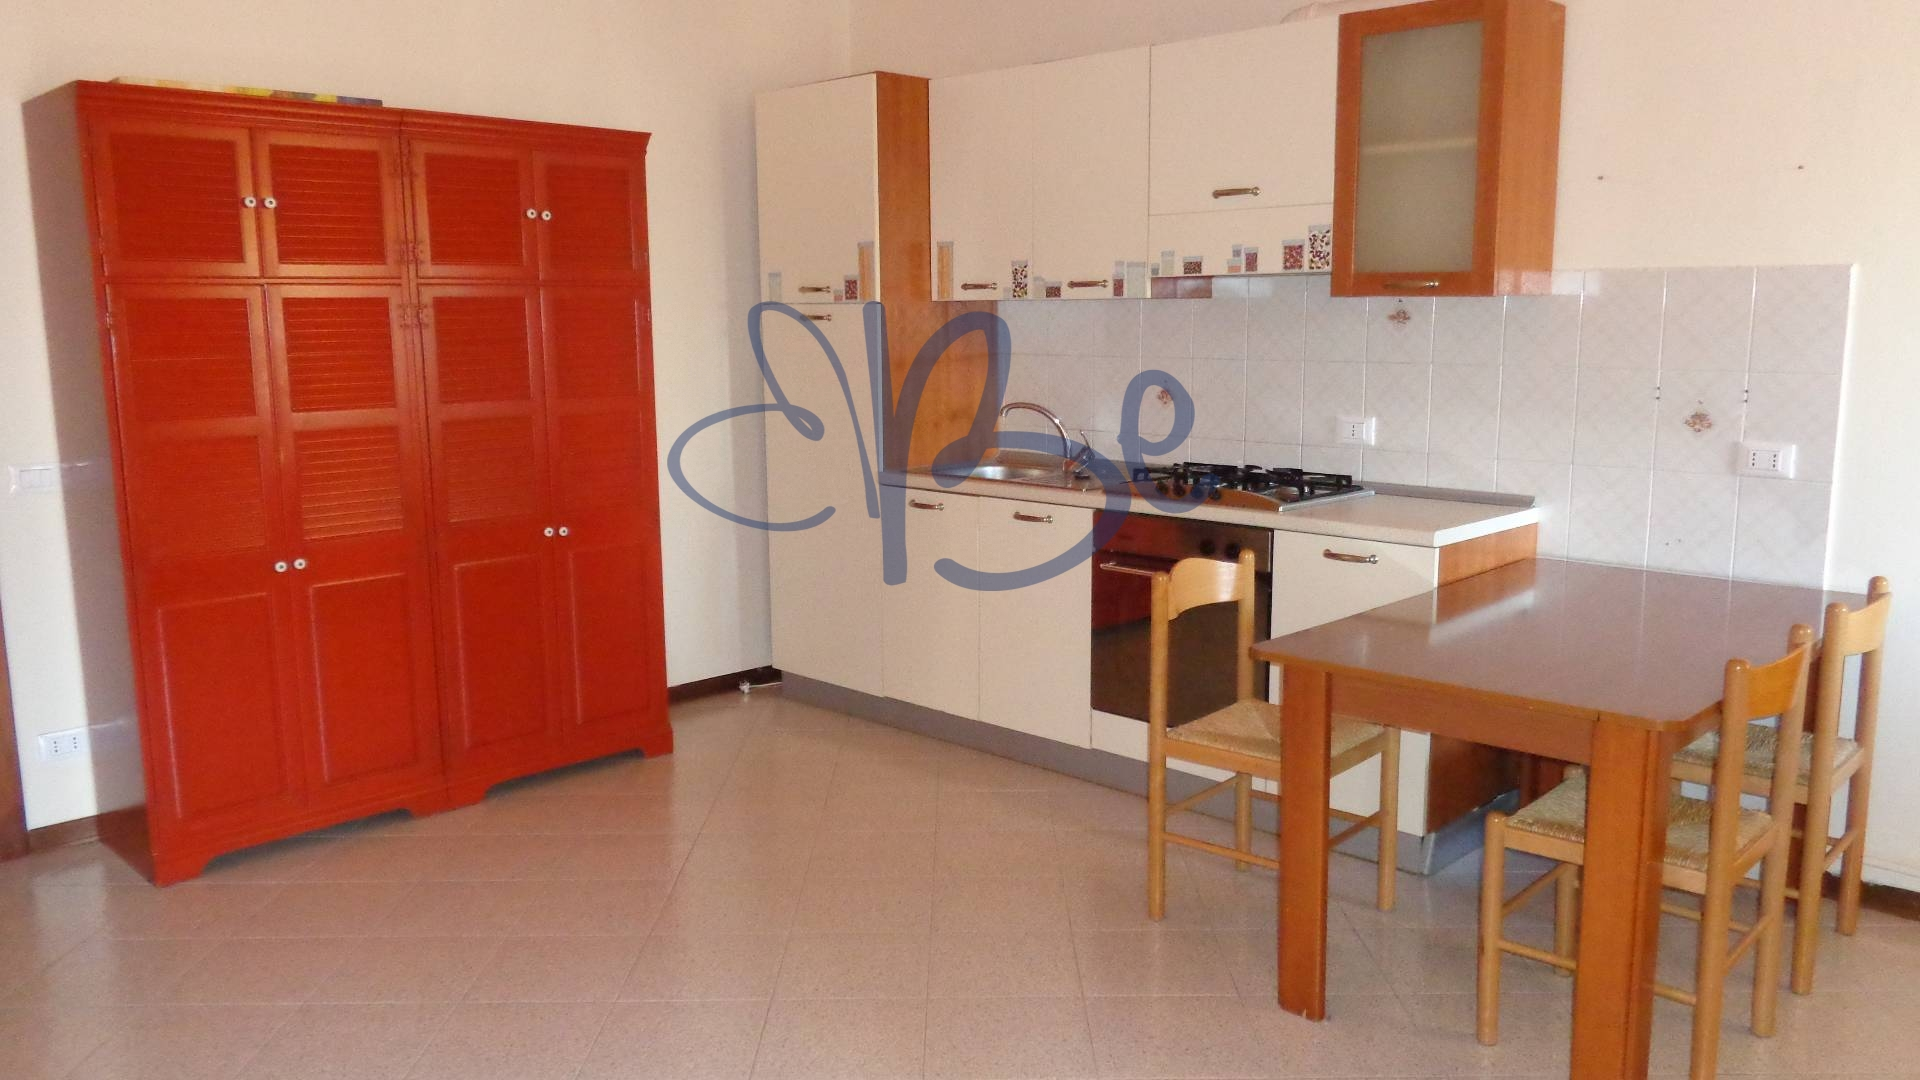 APPARTAMENTO in Affitto a Portese, San Felice Del Benaco (BRESCIA)